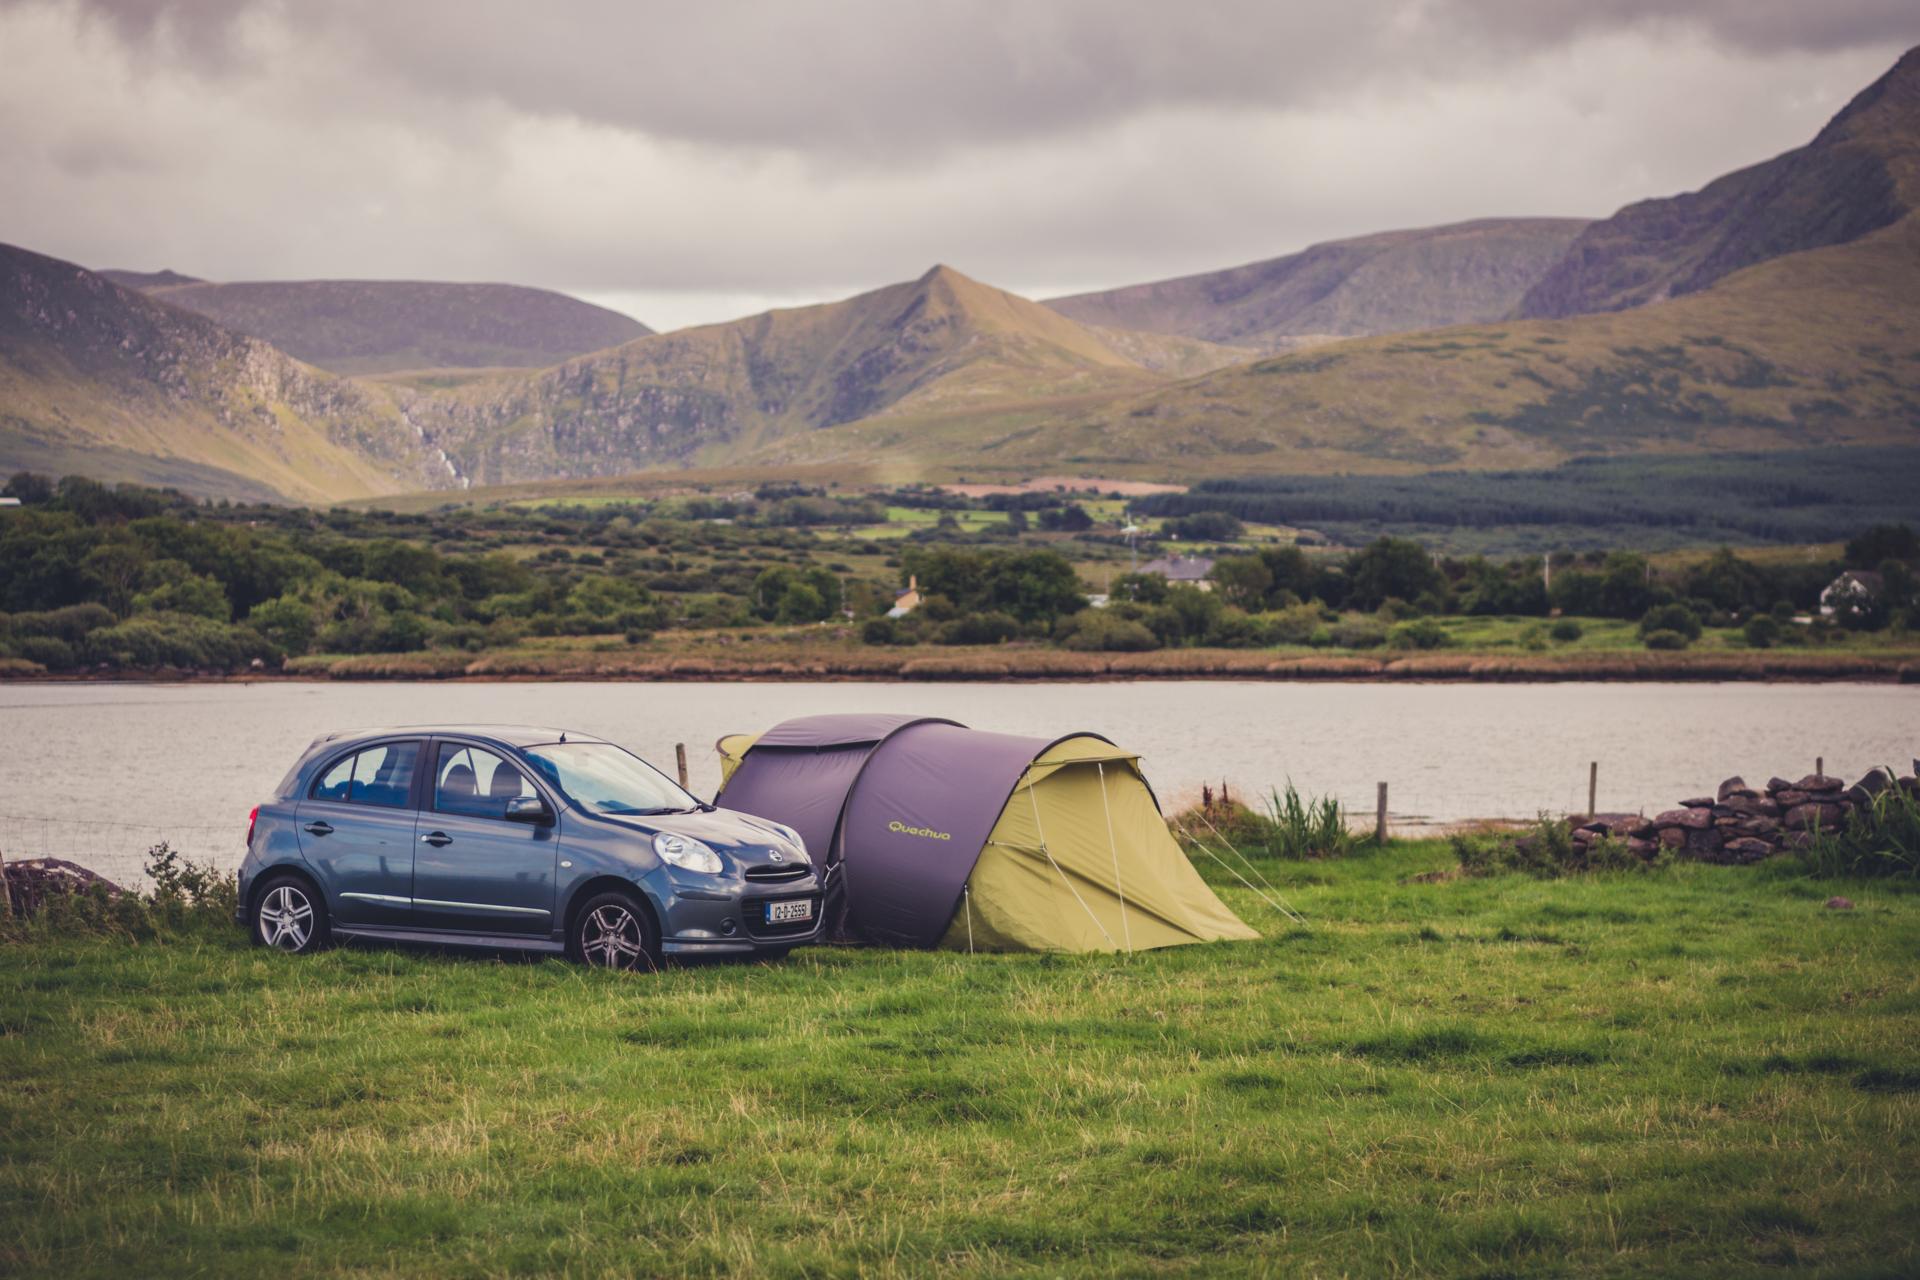 Ireland. Wild Atlantic Way. Kerry. Counthy Kerry. Travel photography. Landscape photography. Blog. Irish. Travelling Ireland. Ireland west coast. Wild Landscape. Trip. Vacation. -3.jpg